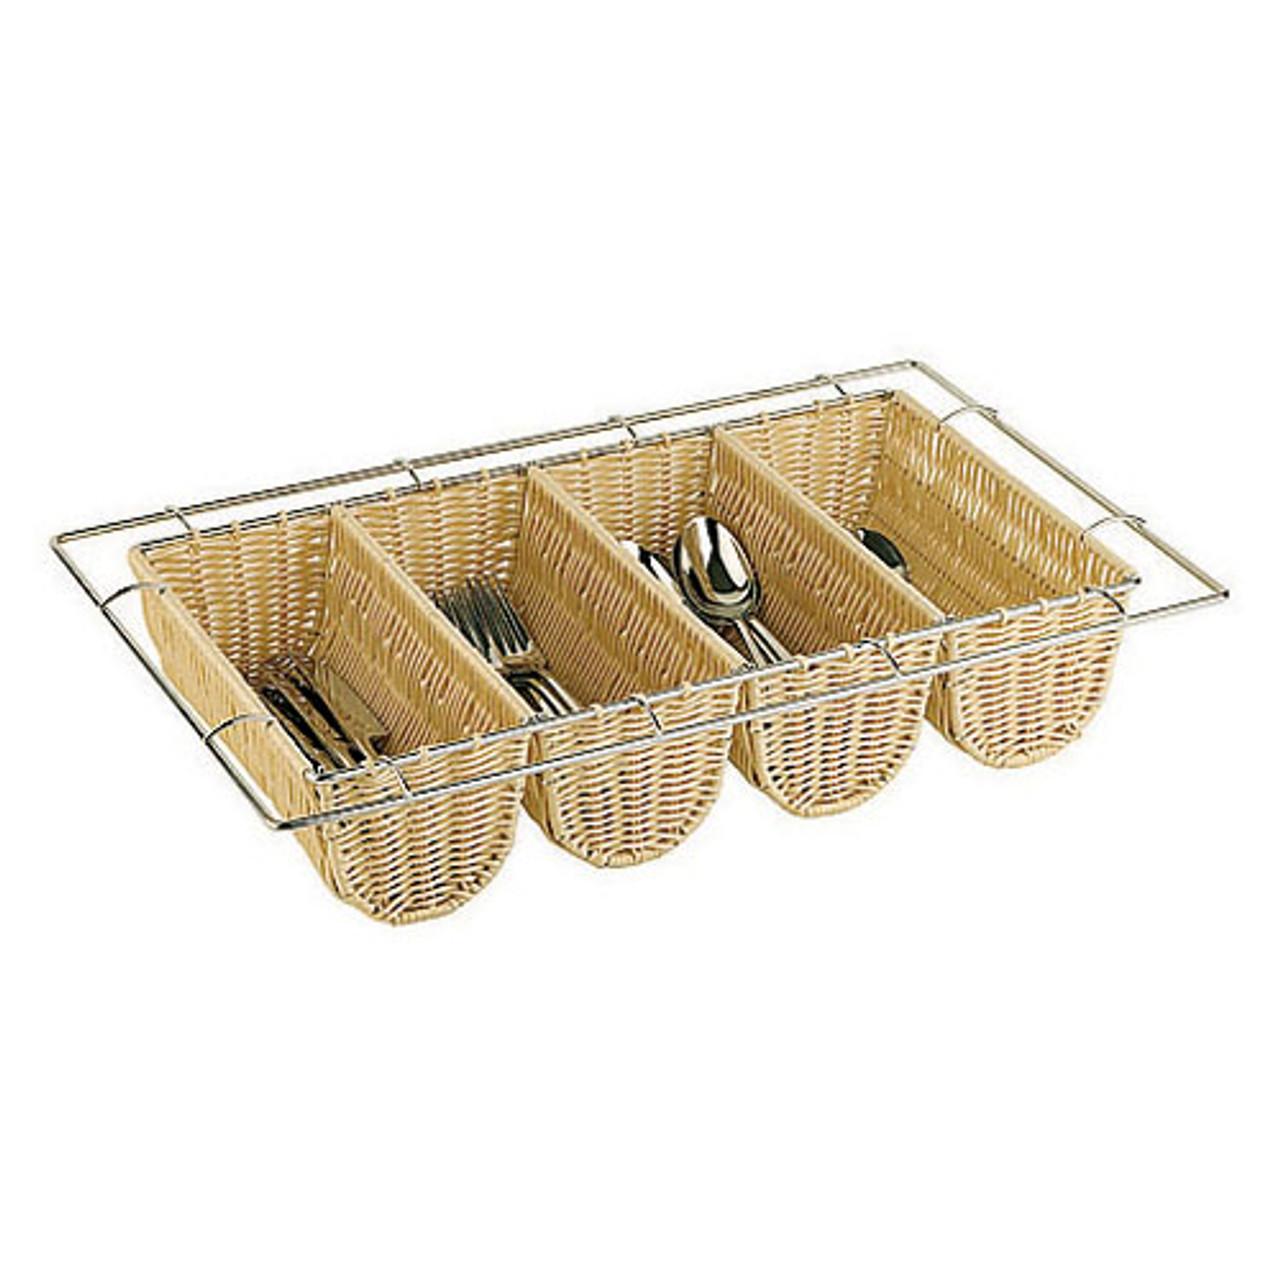 Polyrattan Four Compartment Flatware Basket -  (1/1 ) , L 20.875 x W 12.75 x H 2.5